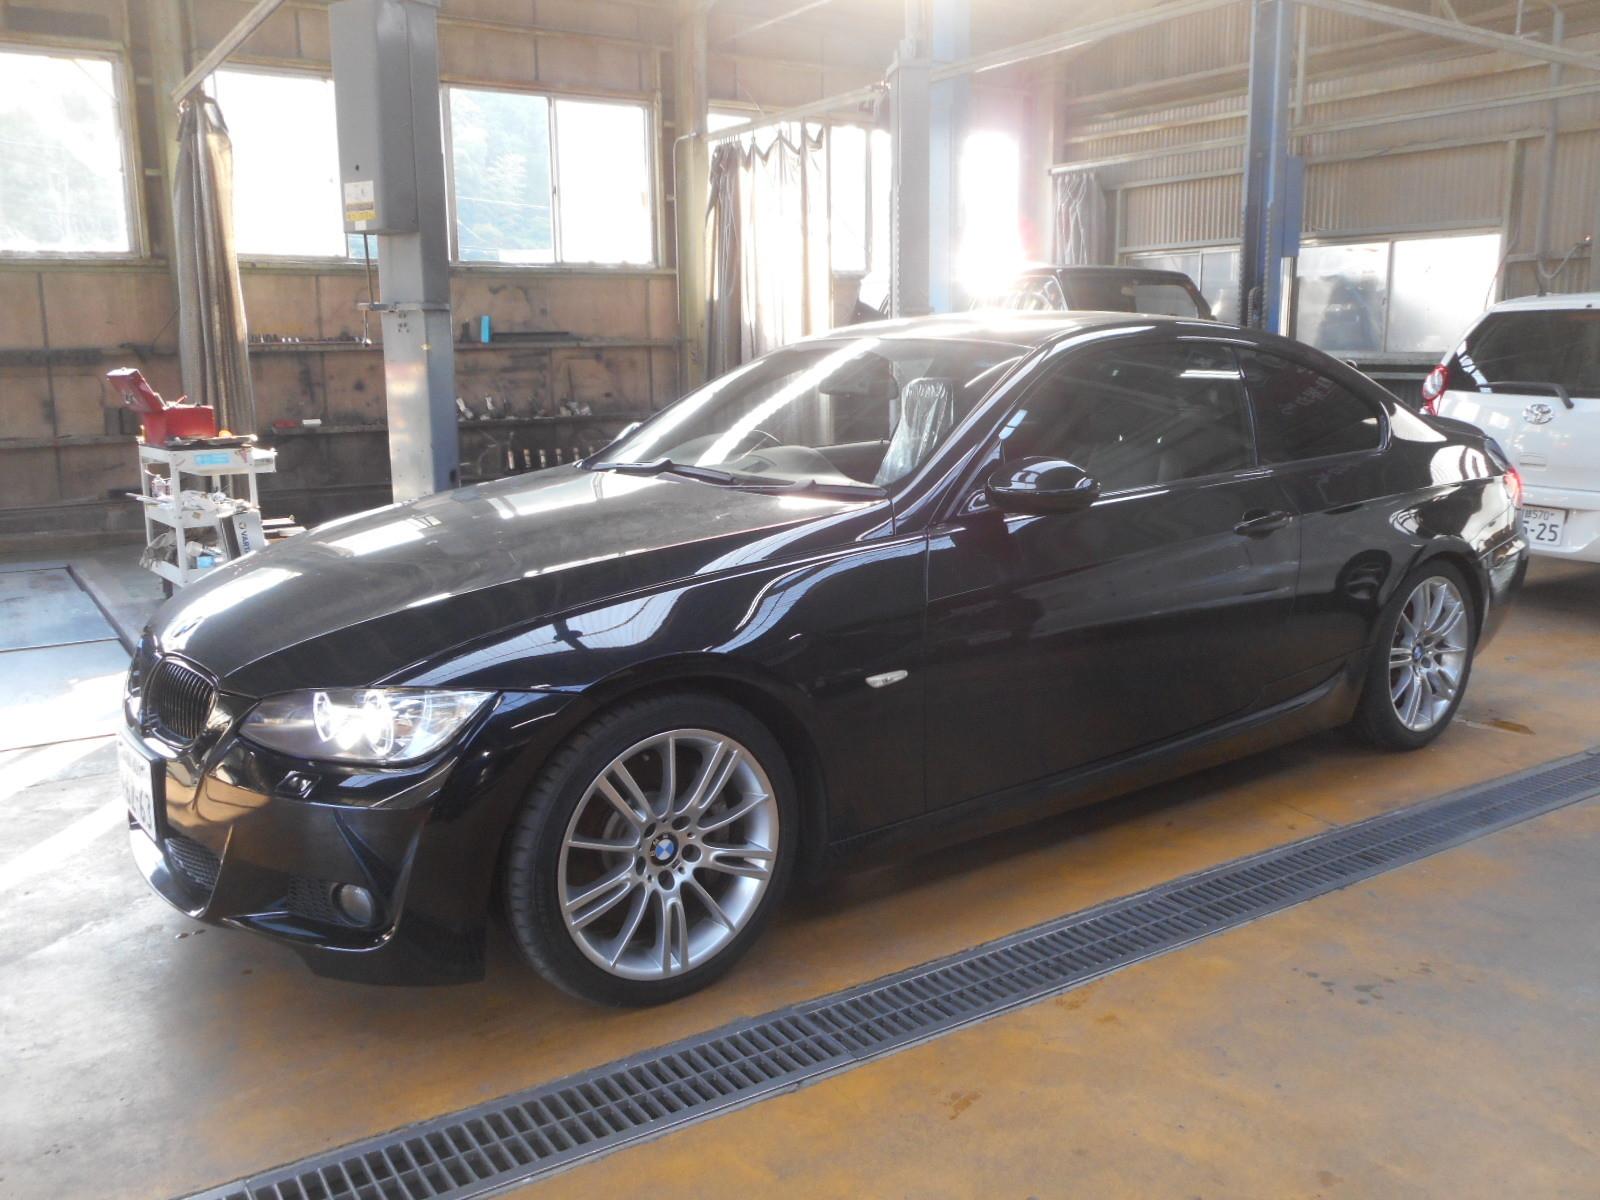 BMW335 クーペ (E90) エンジンオイル漏れ修理 納車整備_c0267693_17105395.jpg